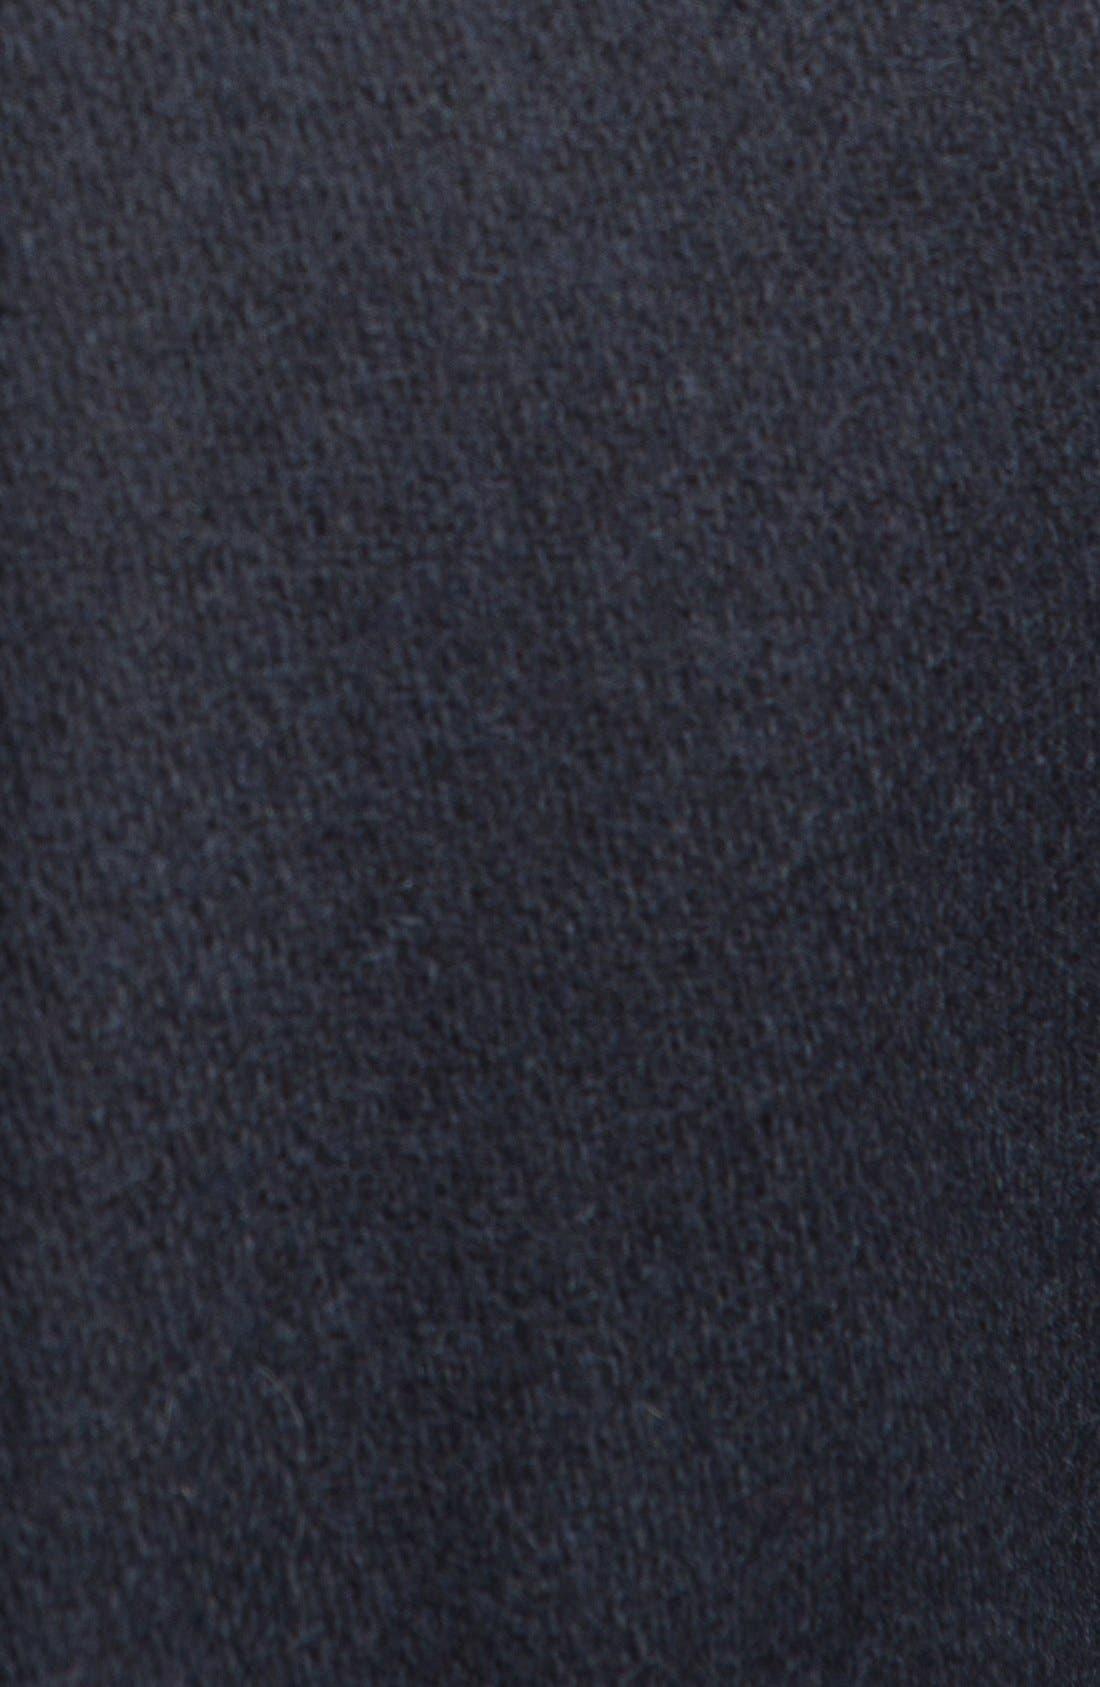 Alternate Image 3  - A.P.C. Mac Trench Coat